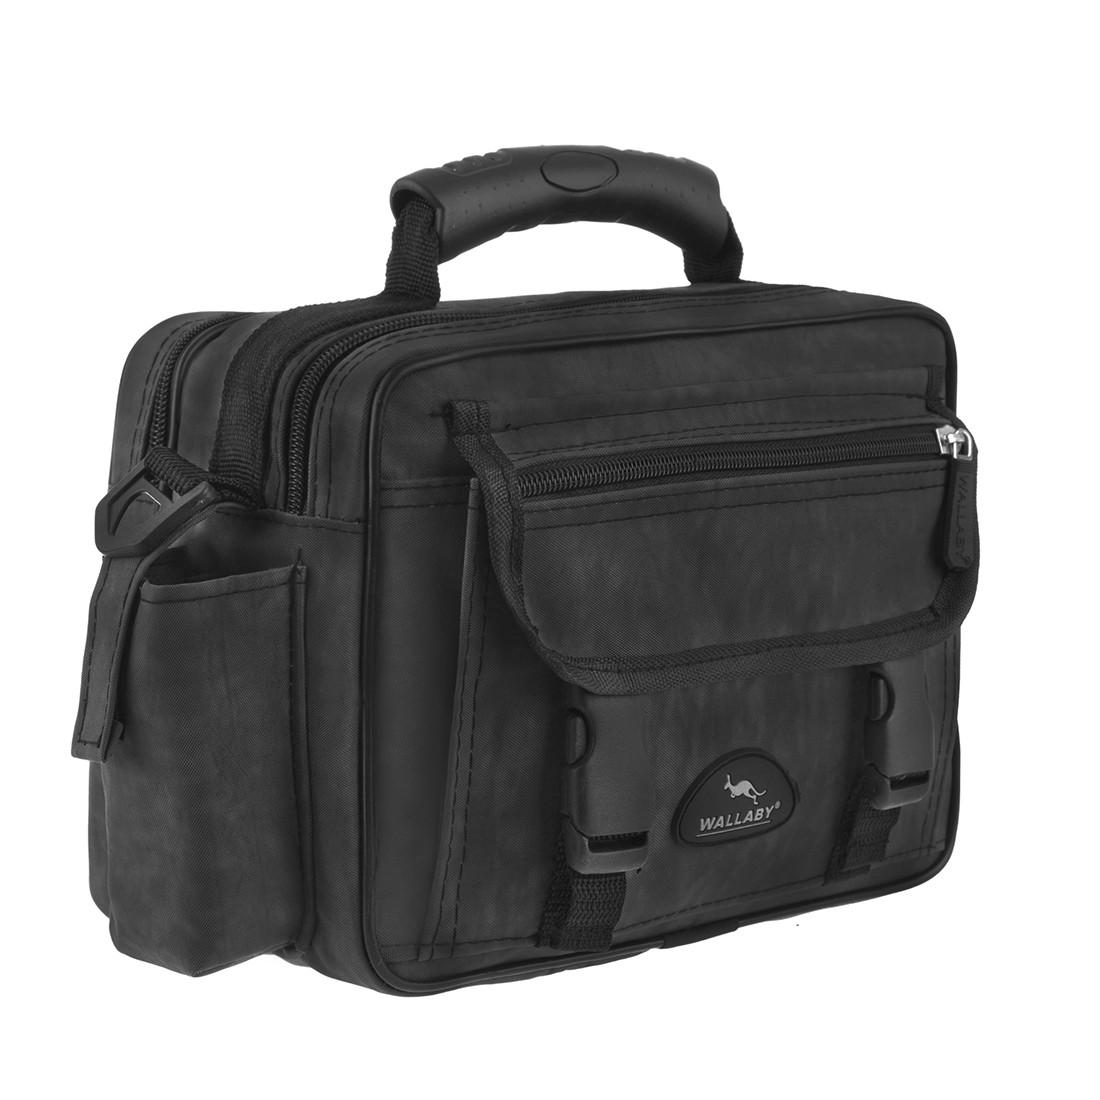 Мужская сумка Wallaby горизонтальная ткань «Кордура» 25х18х13 цвет чёрный,  в2427ч